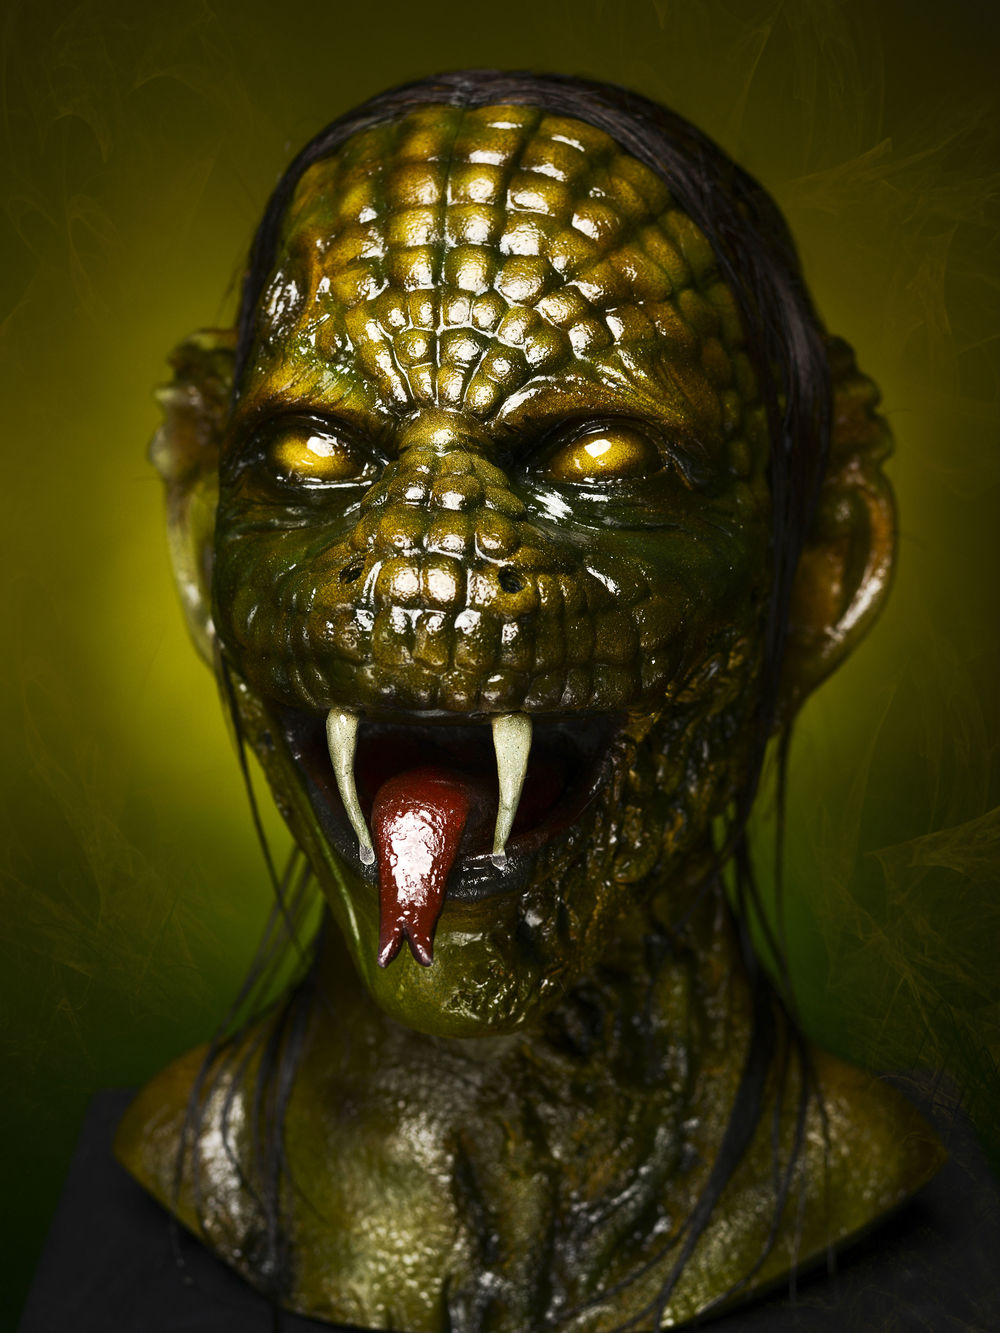 tee - creature.jpg